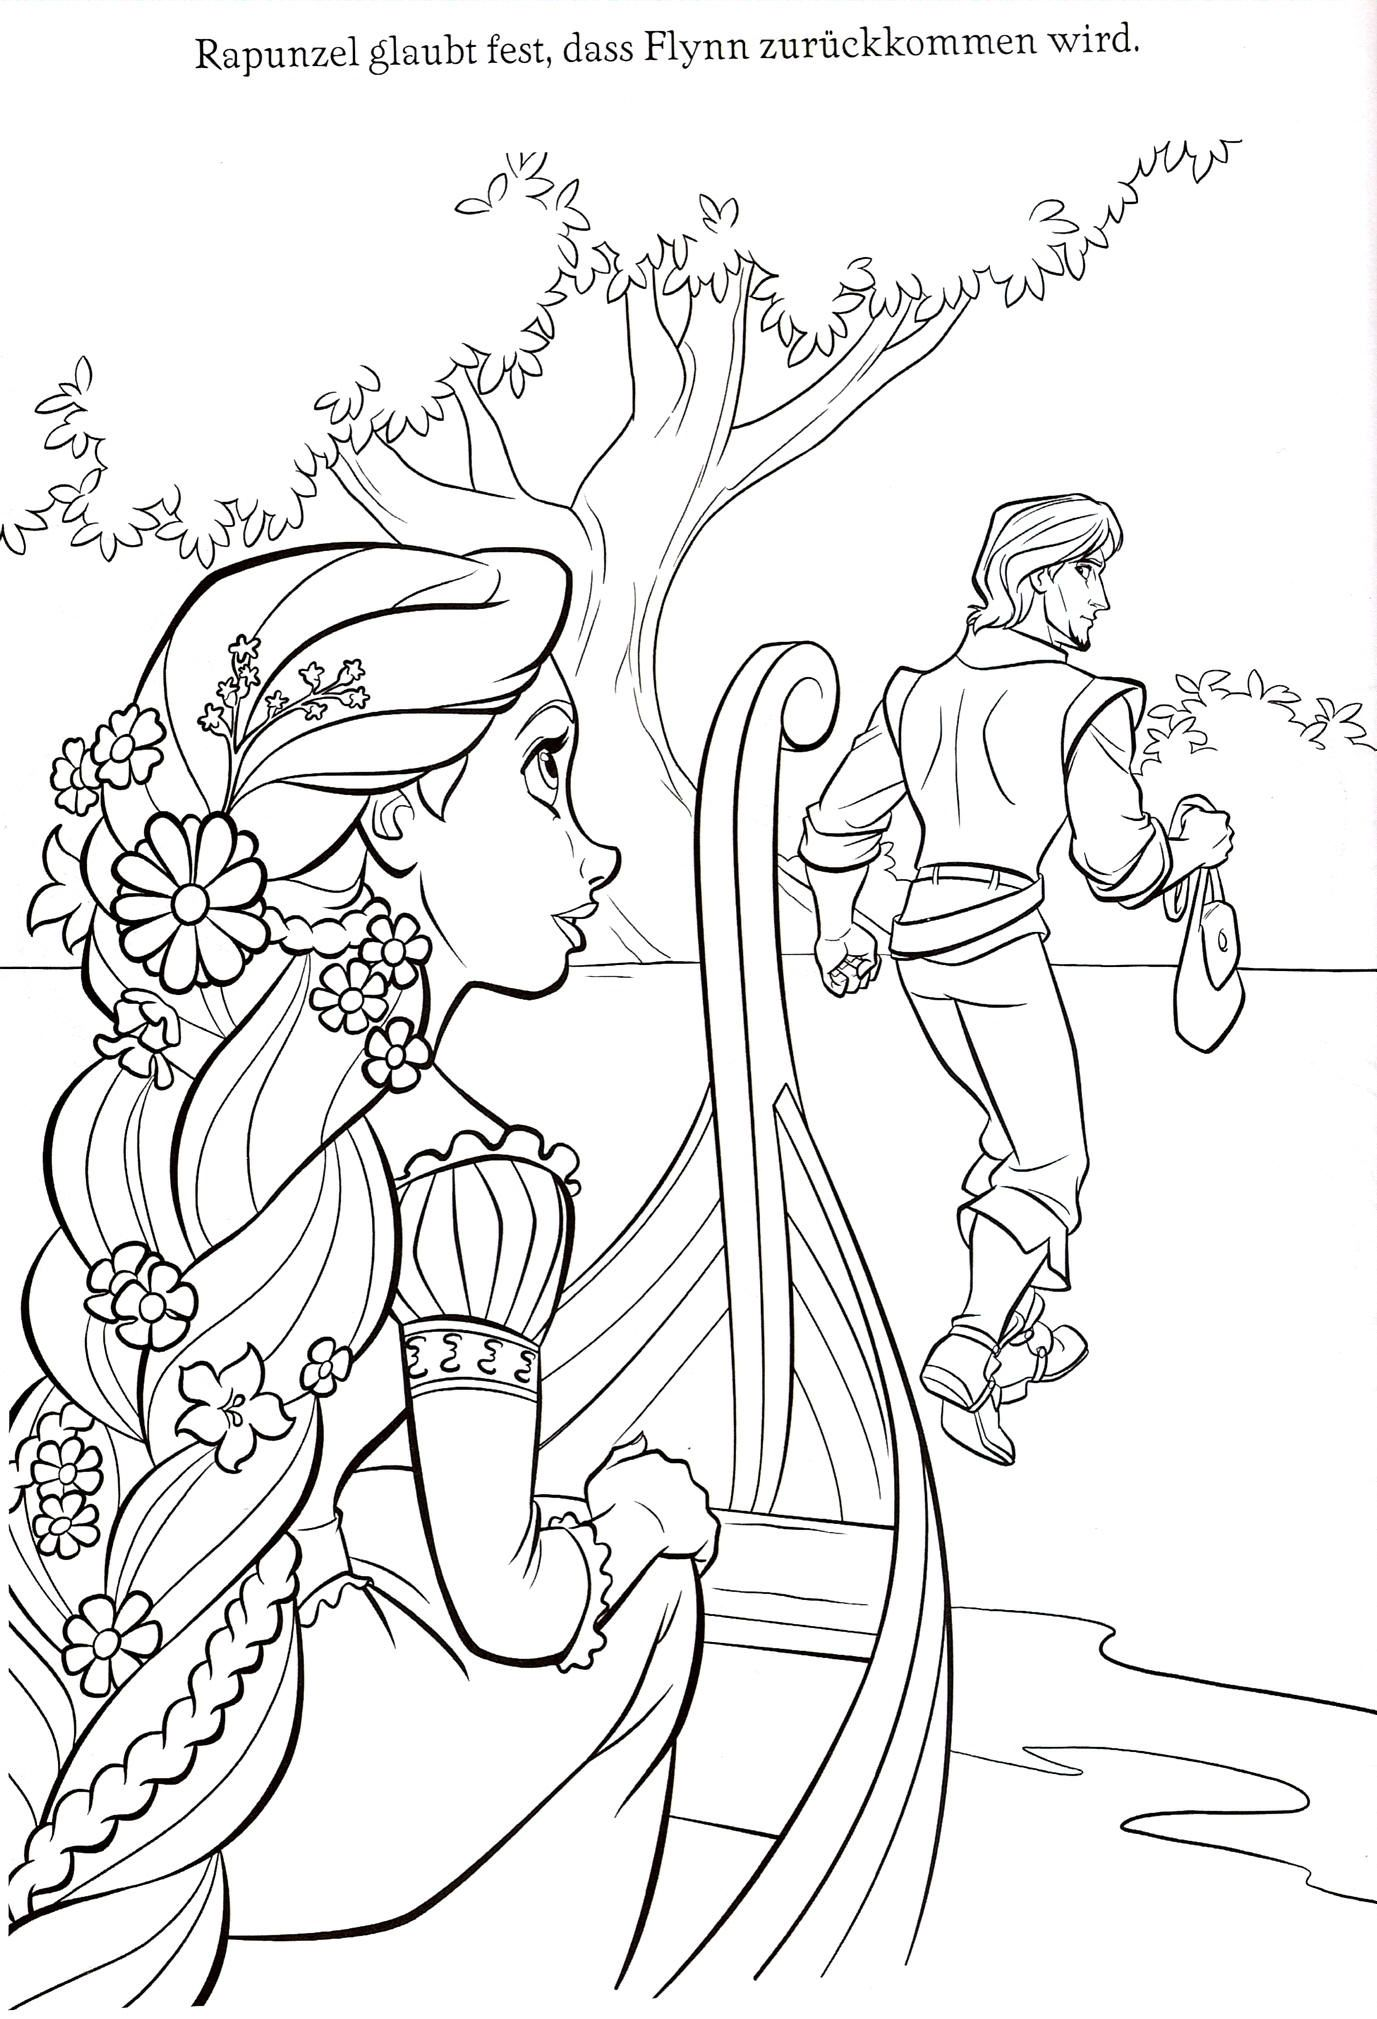 rapunzel coloring google keress - Tangled Coloring Book